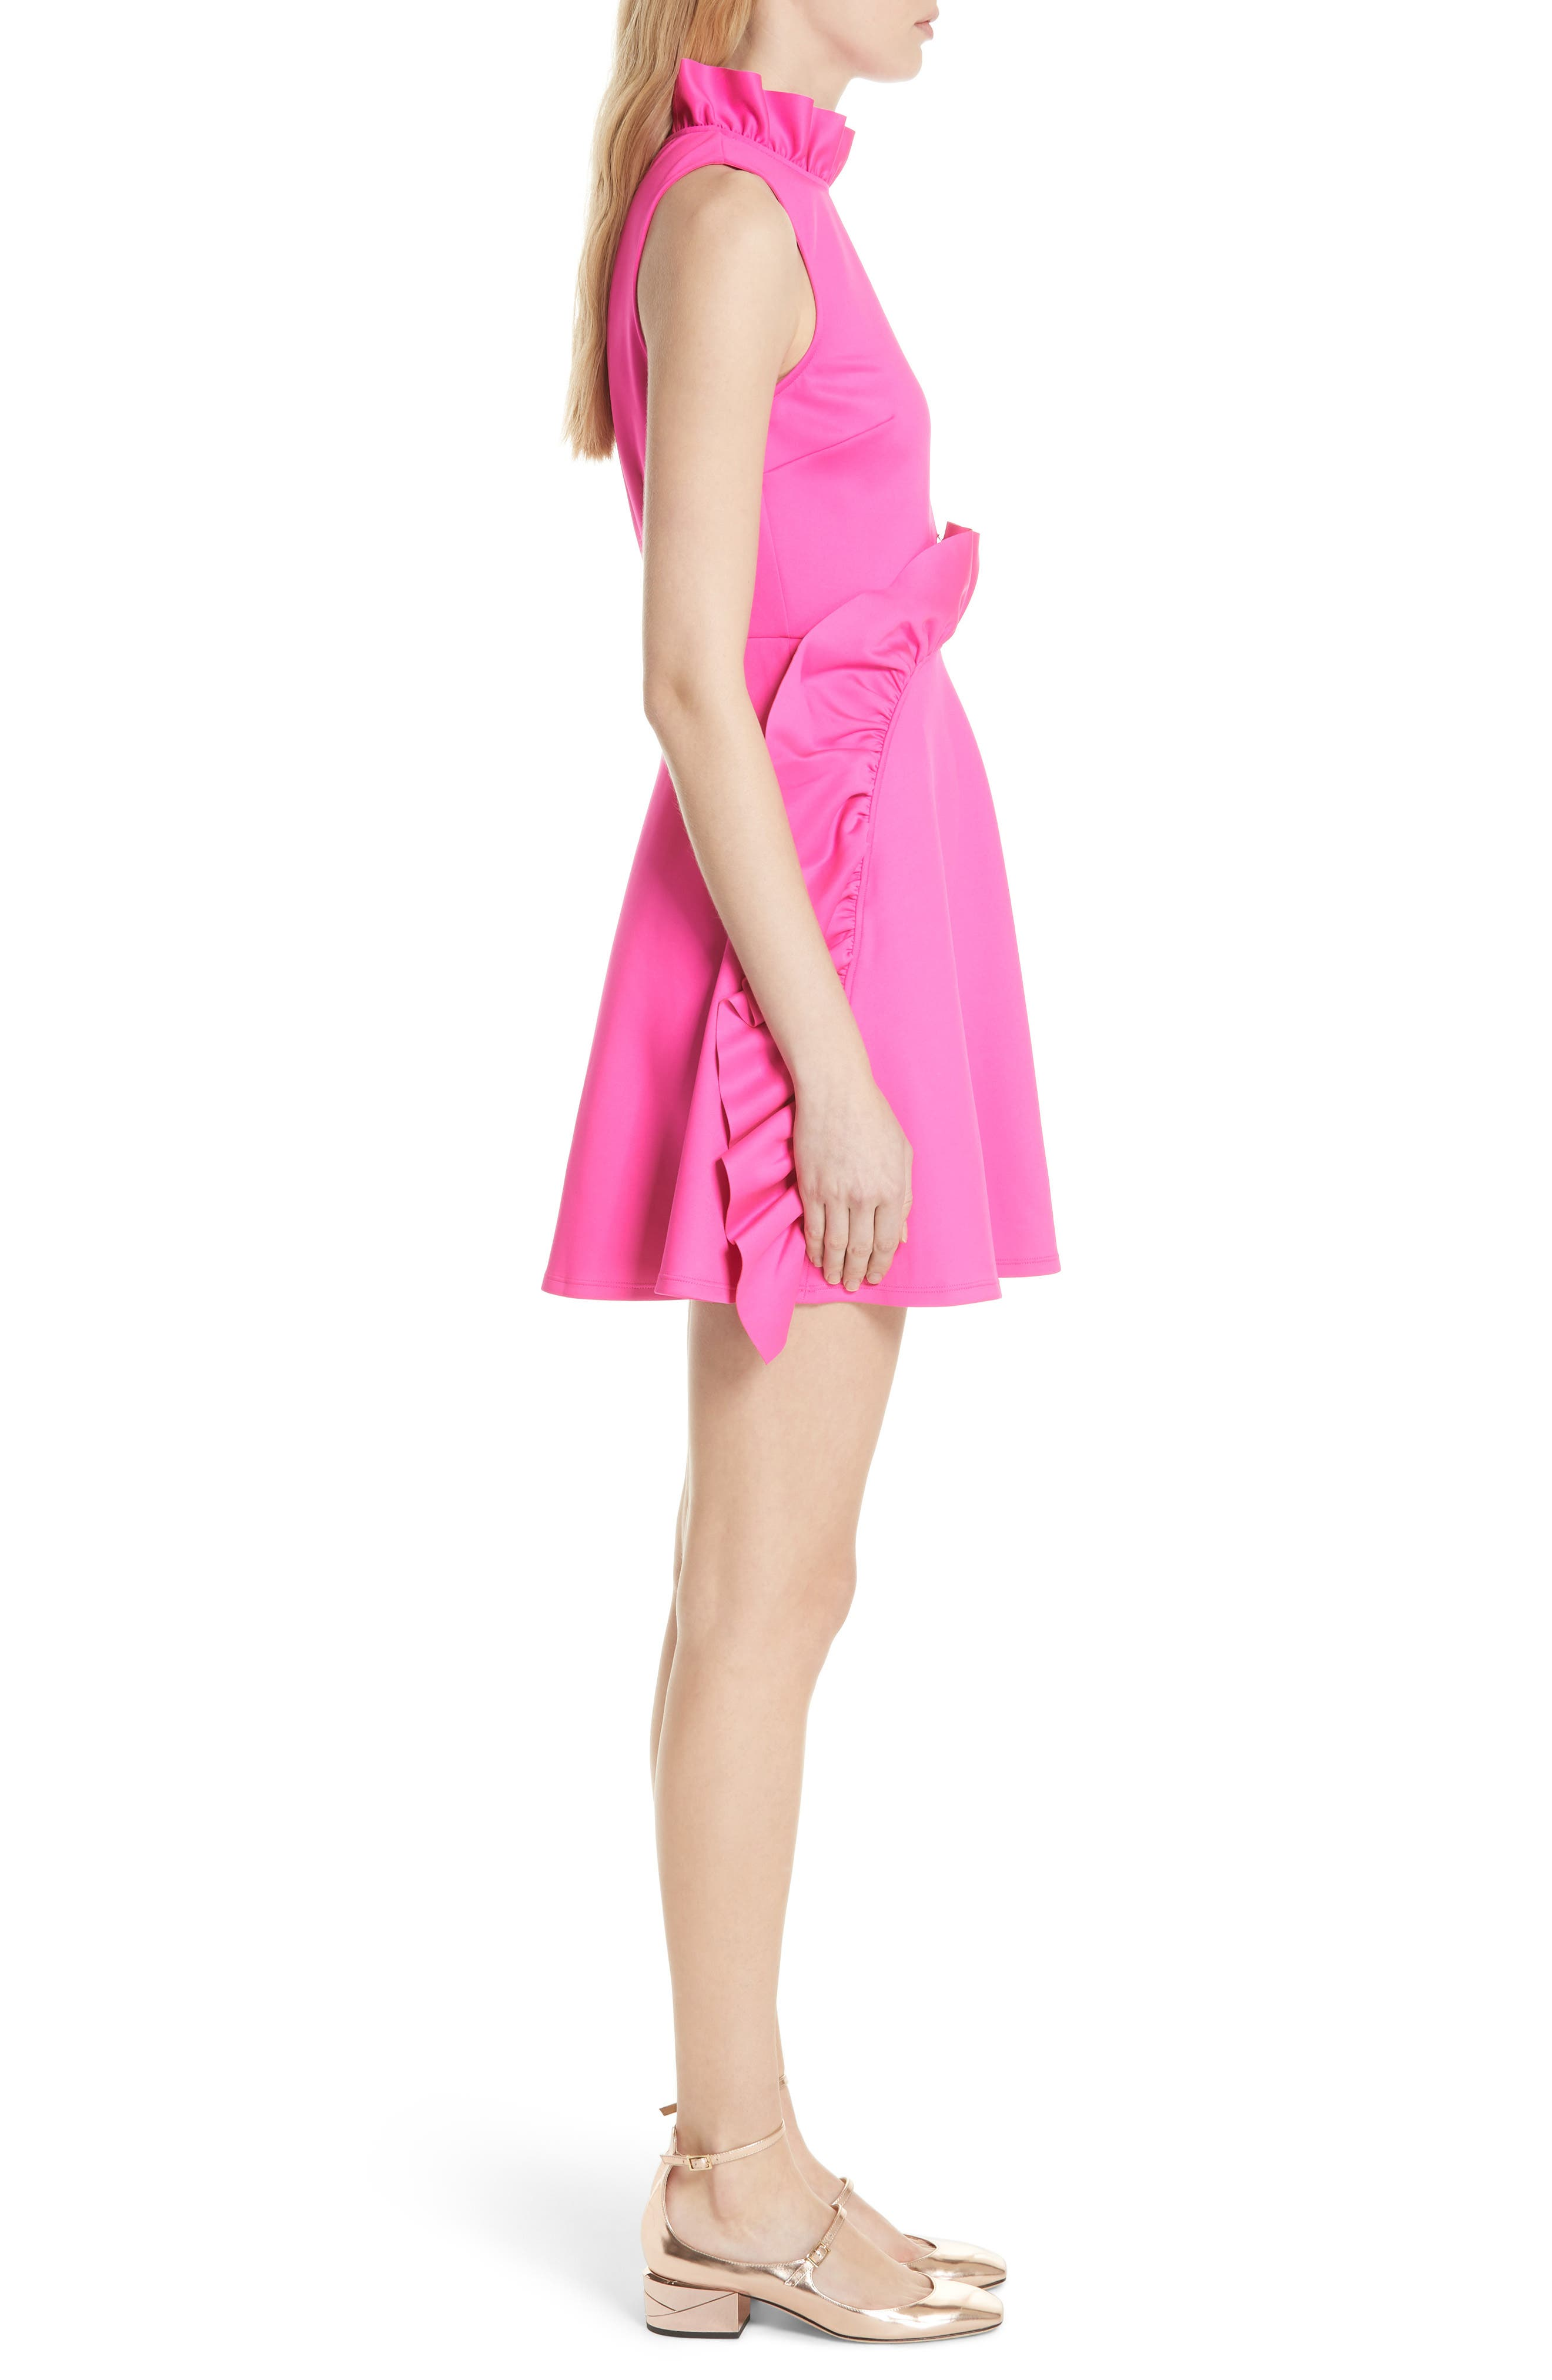 Jannett Laser Cut Ruffle Dress,                             Alternate thumbnail 3, color,                             Neon Pink